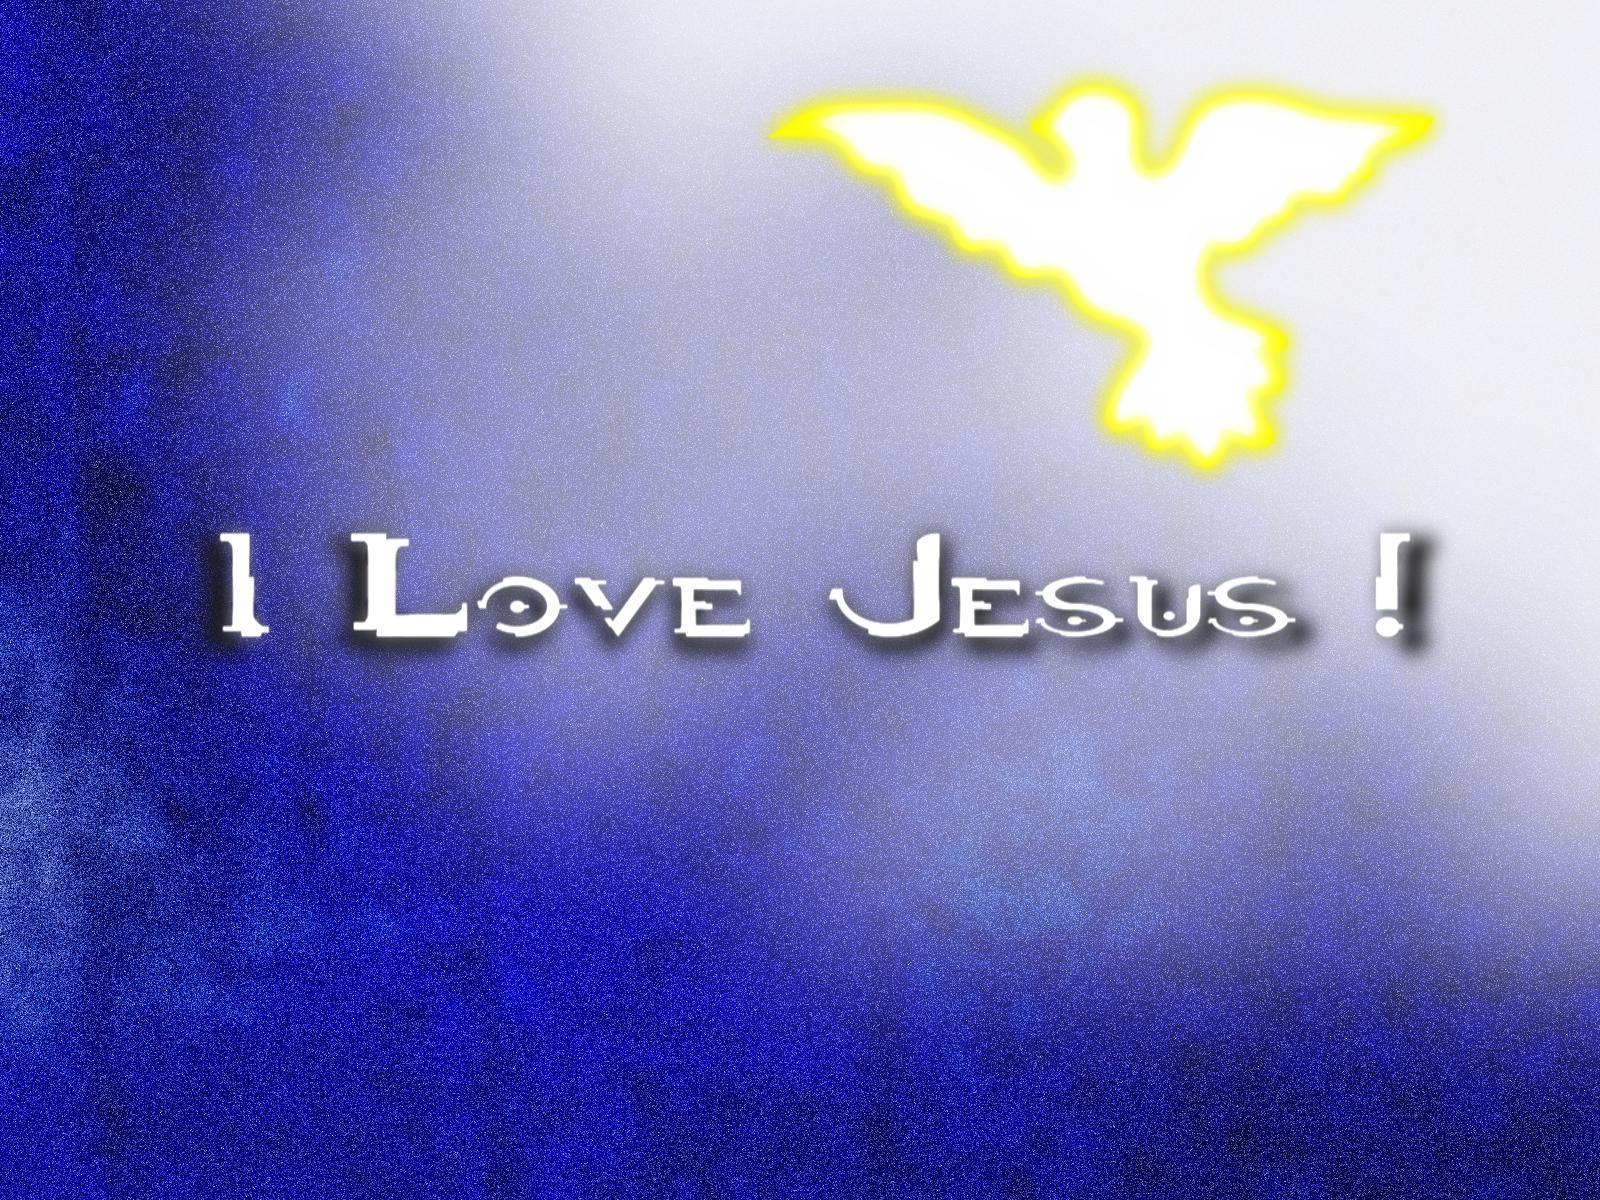 Love U Jesus Wallpaper : I Love Jesus Wallpapers - Wallpaper cave